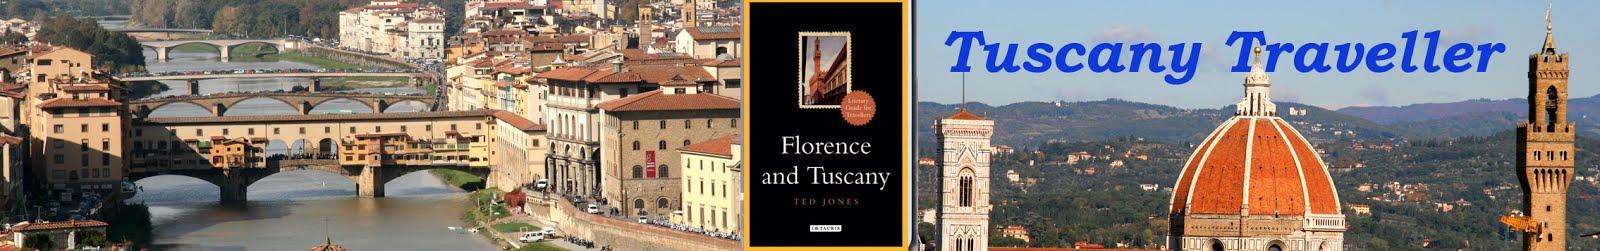 Tuscany Traveller